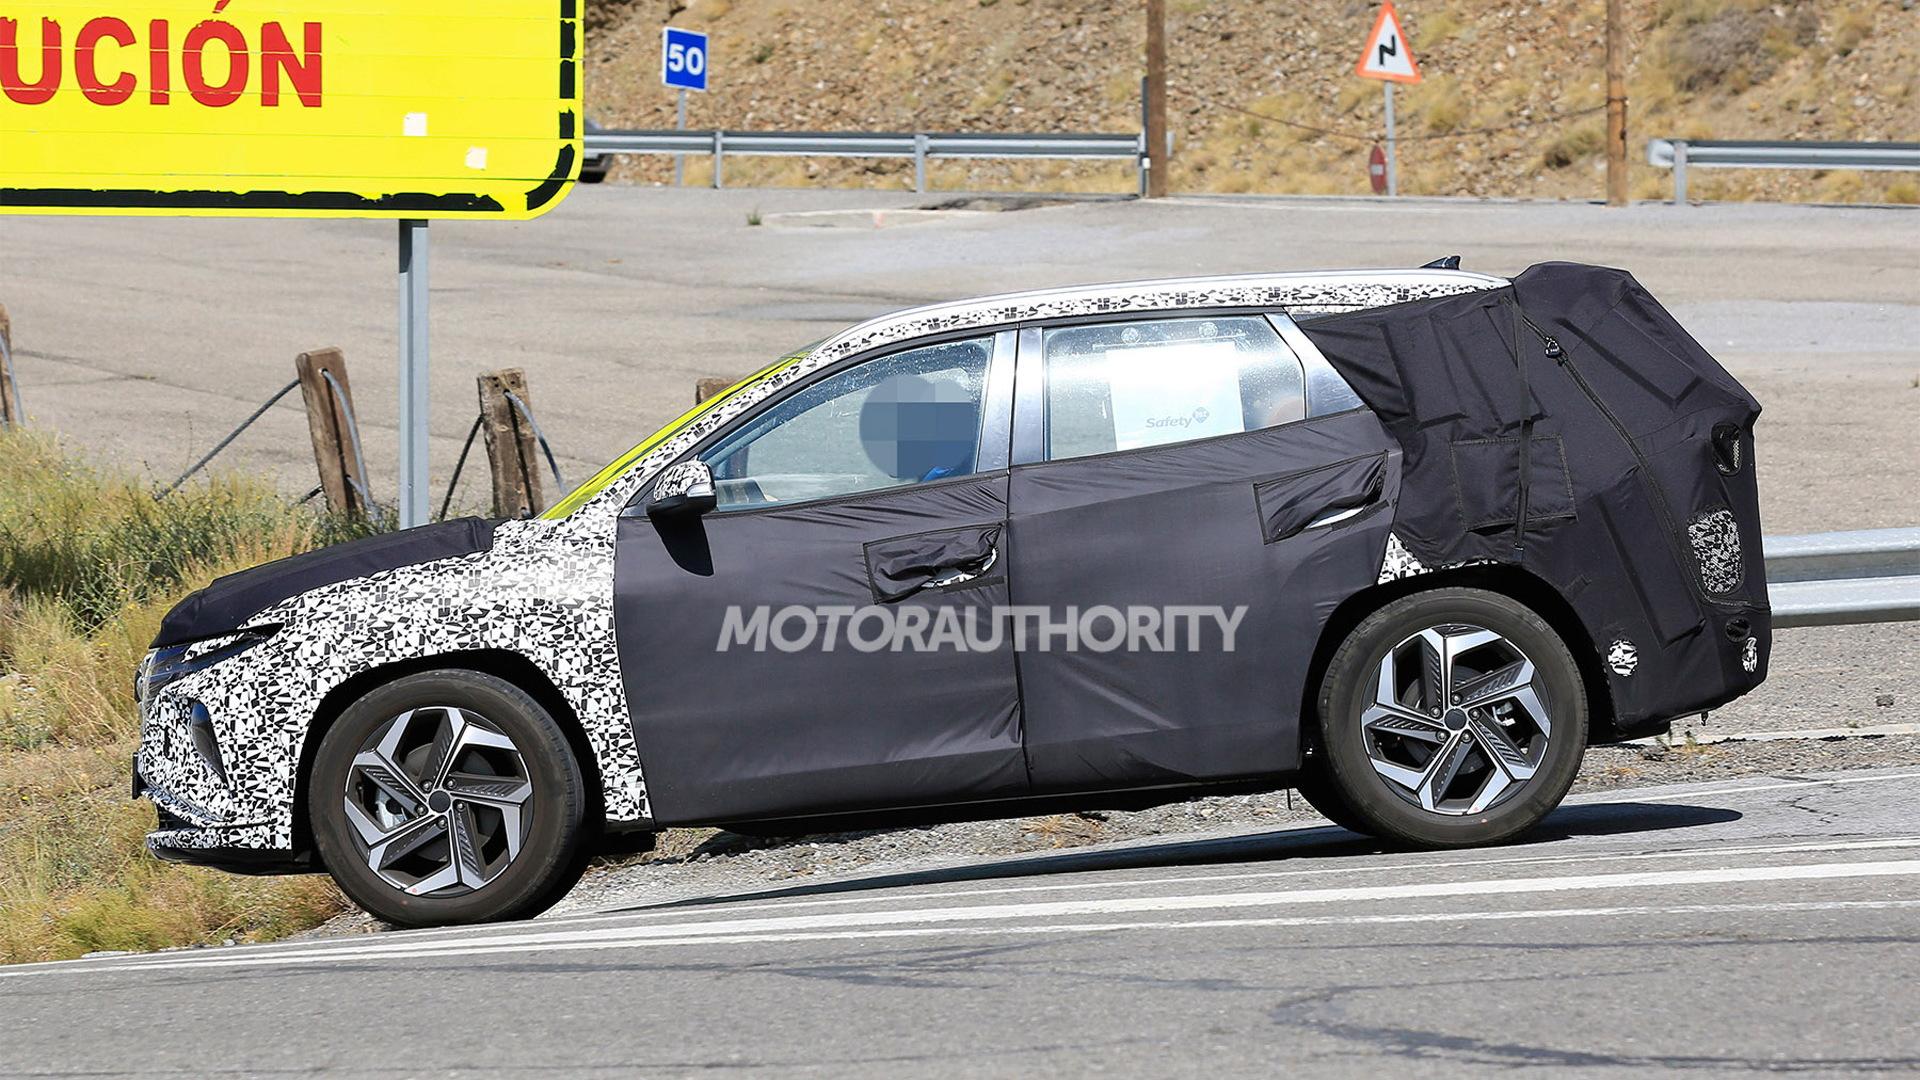 2021 Hyundai Tucson spy shots - Photo credit: S. Baldauf/SB-Medien